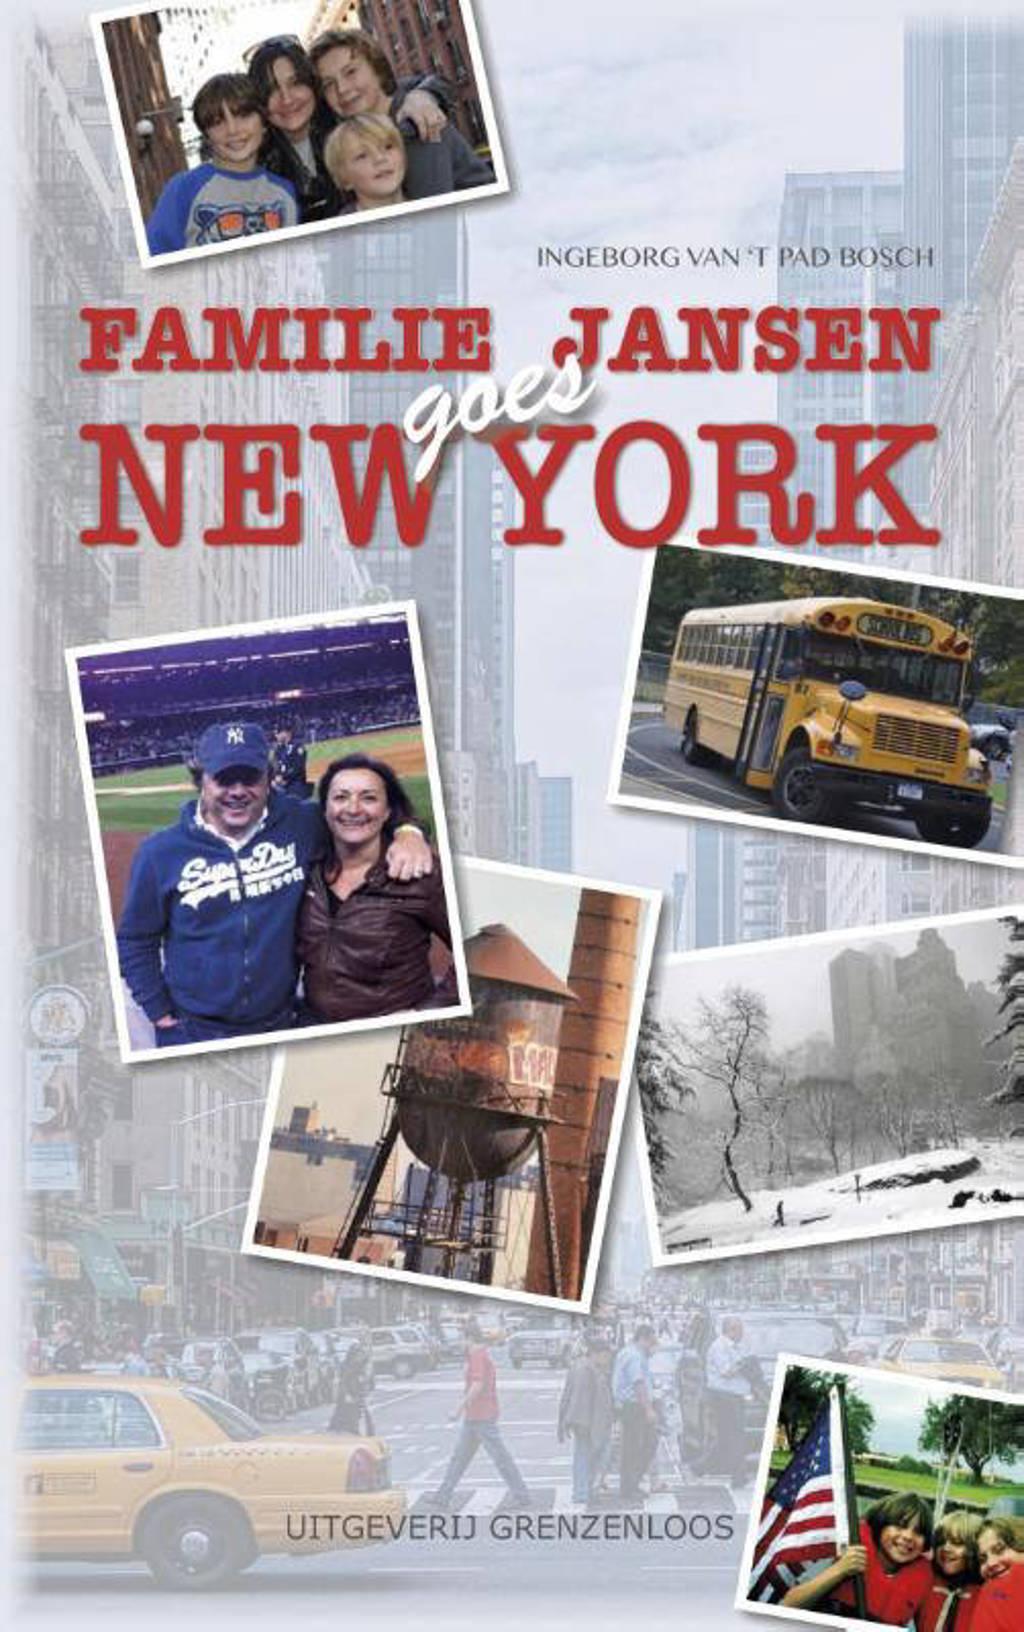 Familie Jansen goes New York - Ingeborg van 't Pad-Bosch